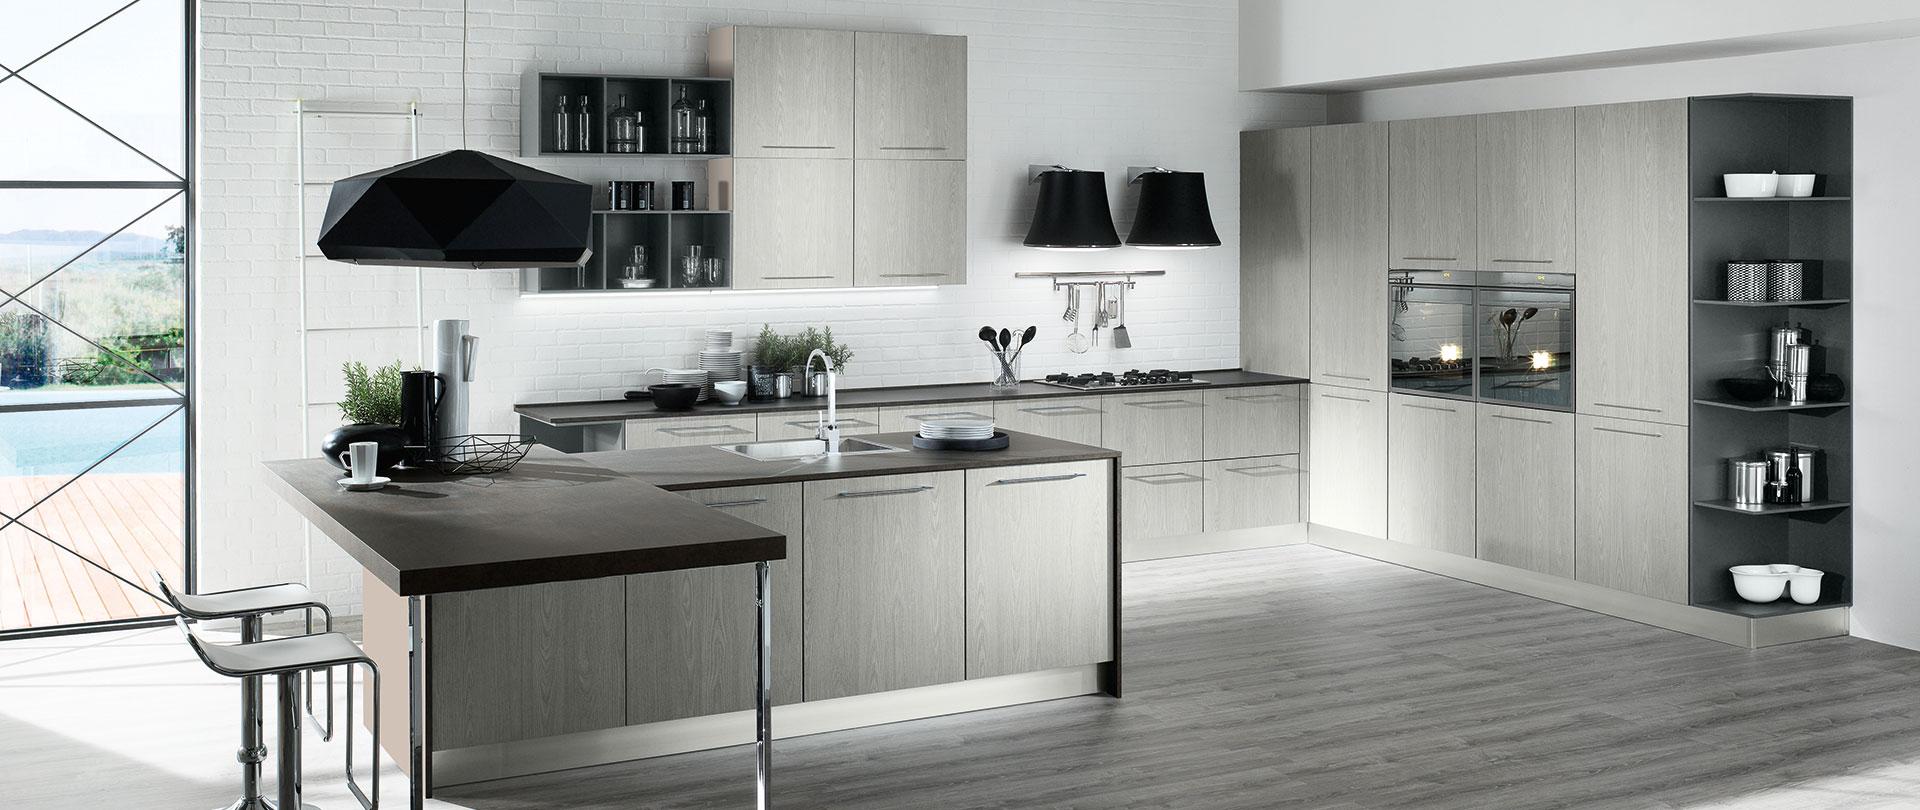 Brio cucina moderna mobilturi arredi 2000 - Cucine mobilturi ...